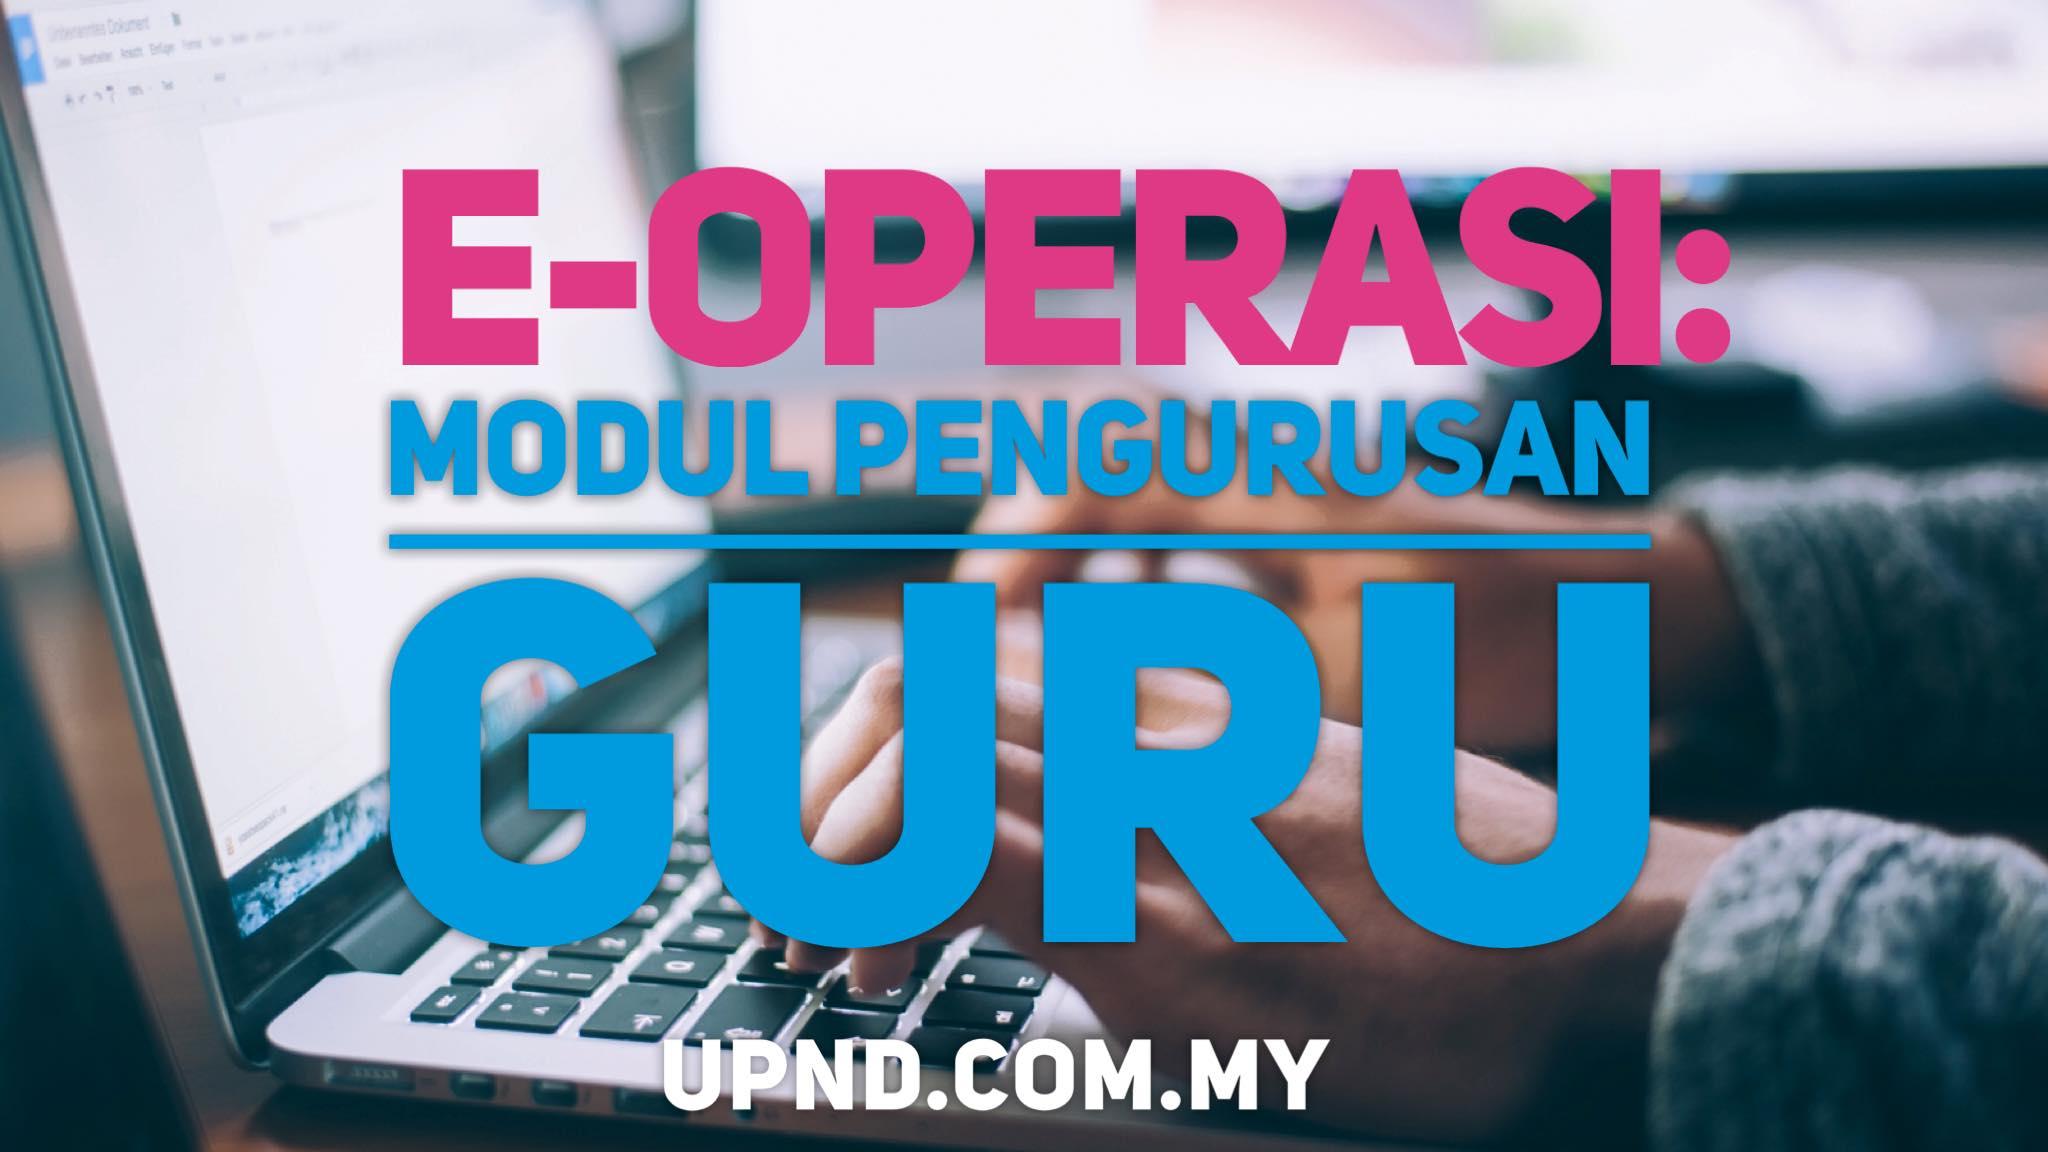 login e-operasi